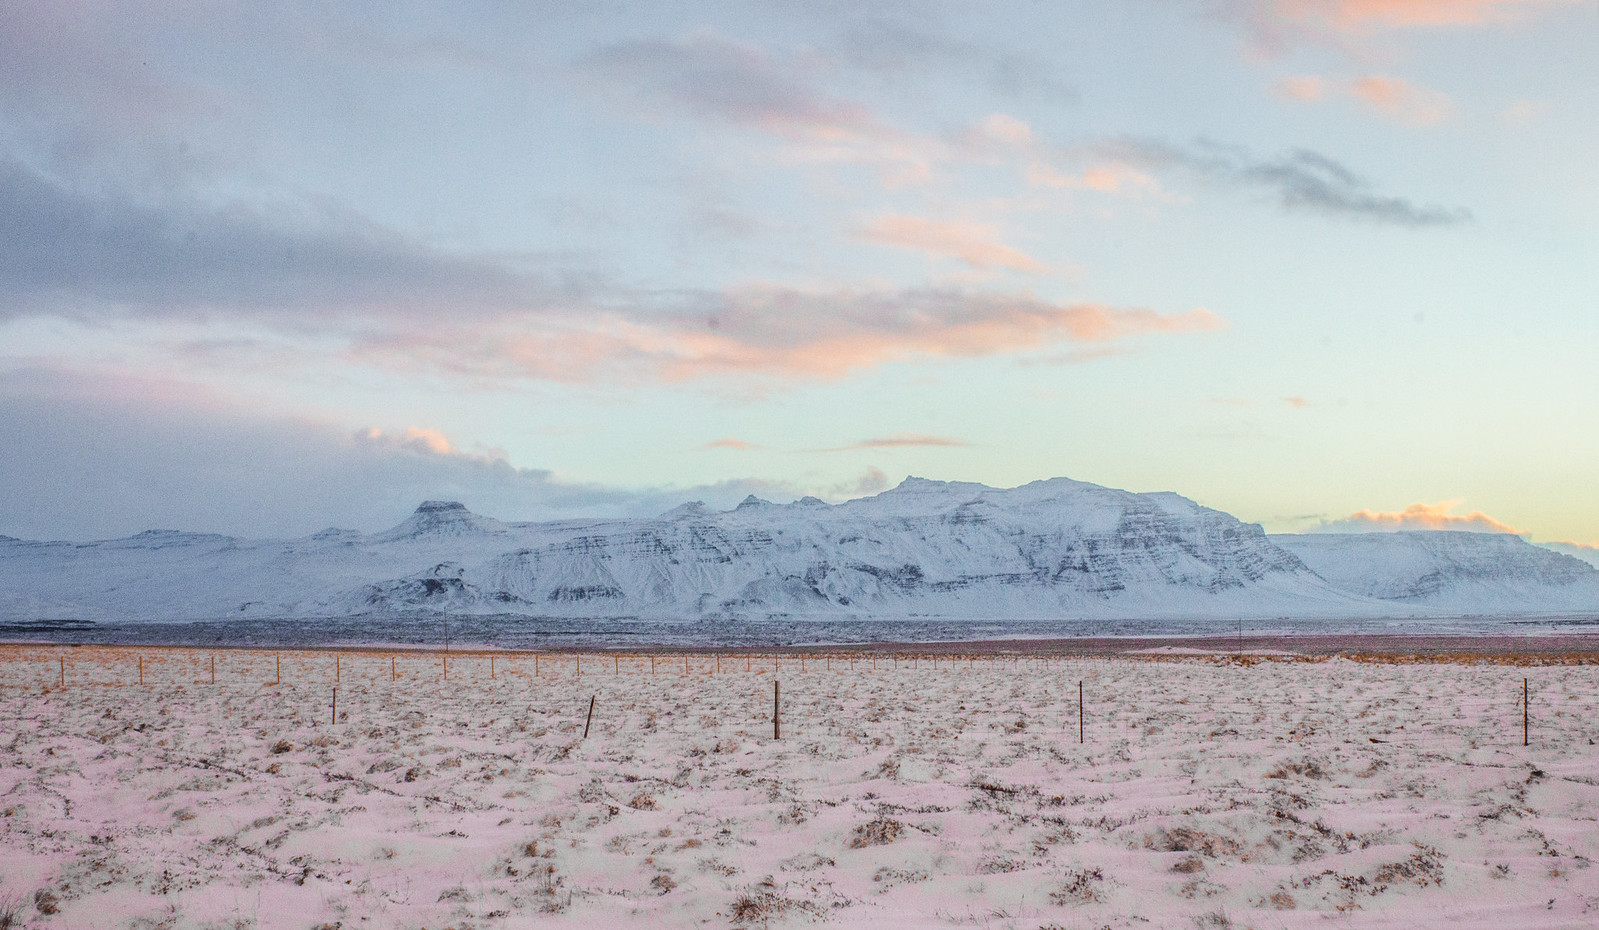 Iceland's golden glow morning sunrise in Snaefellsnes Peninsula